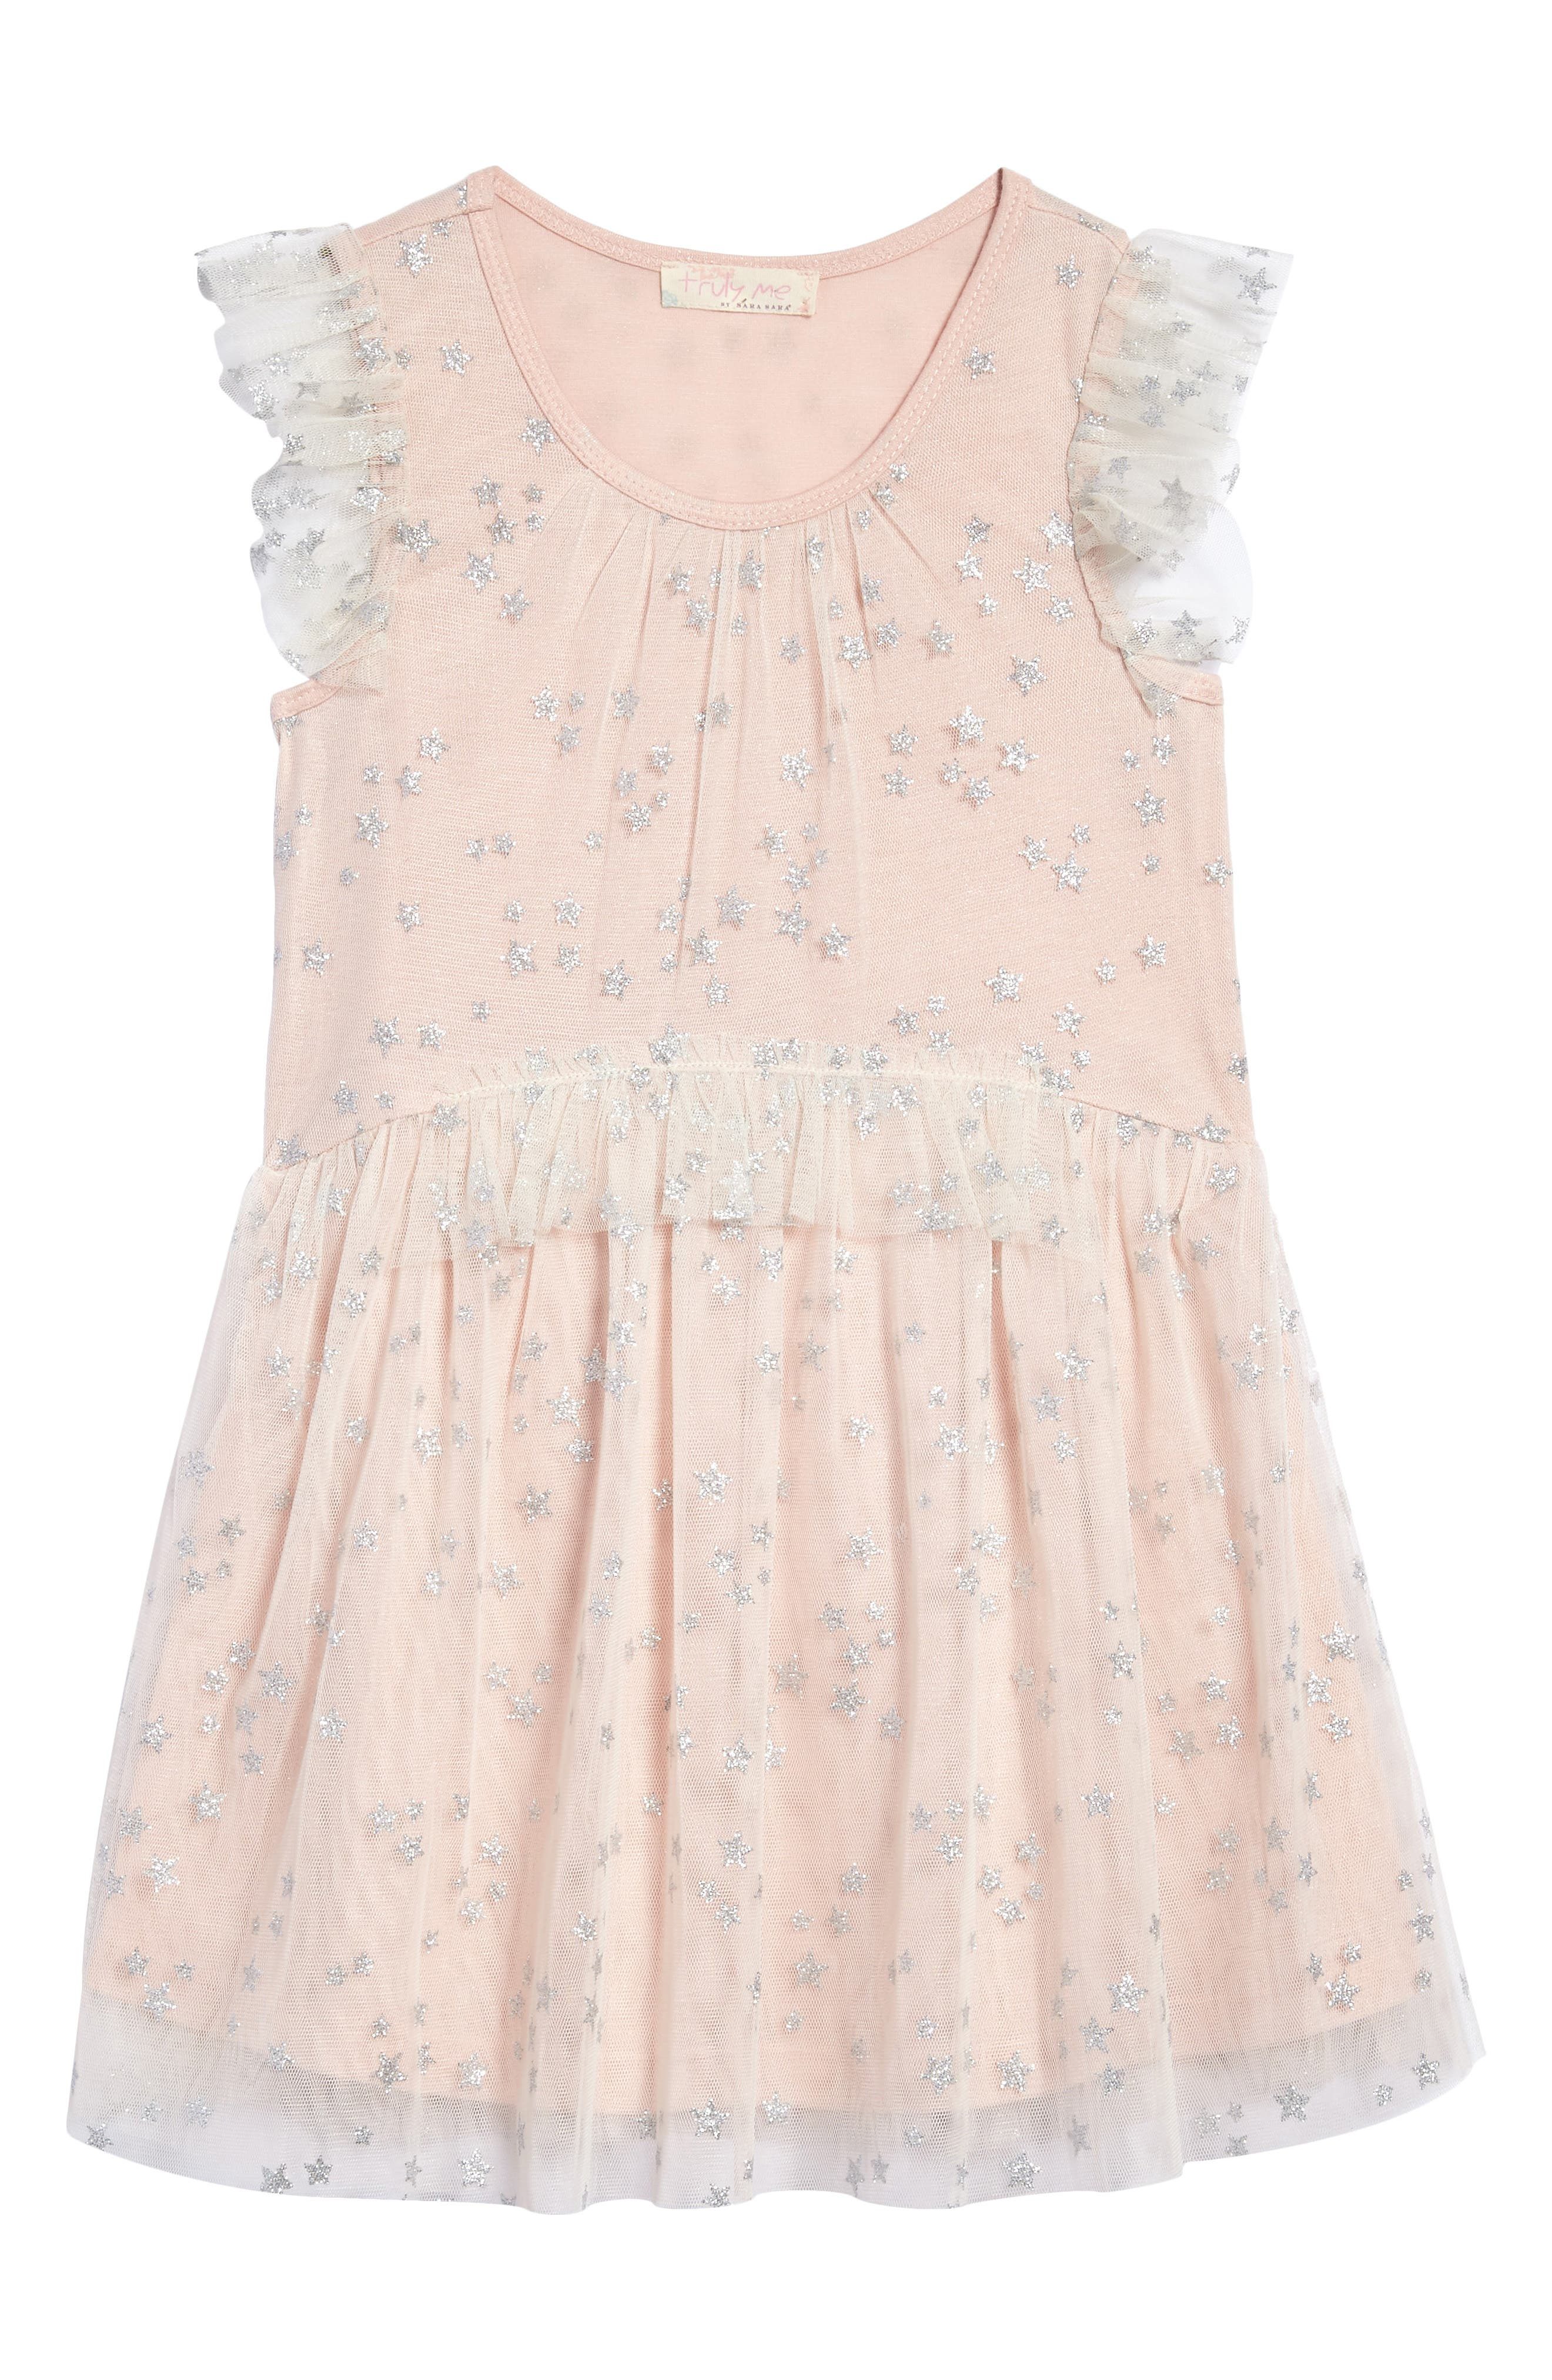 Main Image - Truly Me Mesh Star Dress (Toddler Girls & Little Girls)